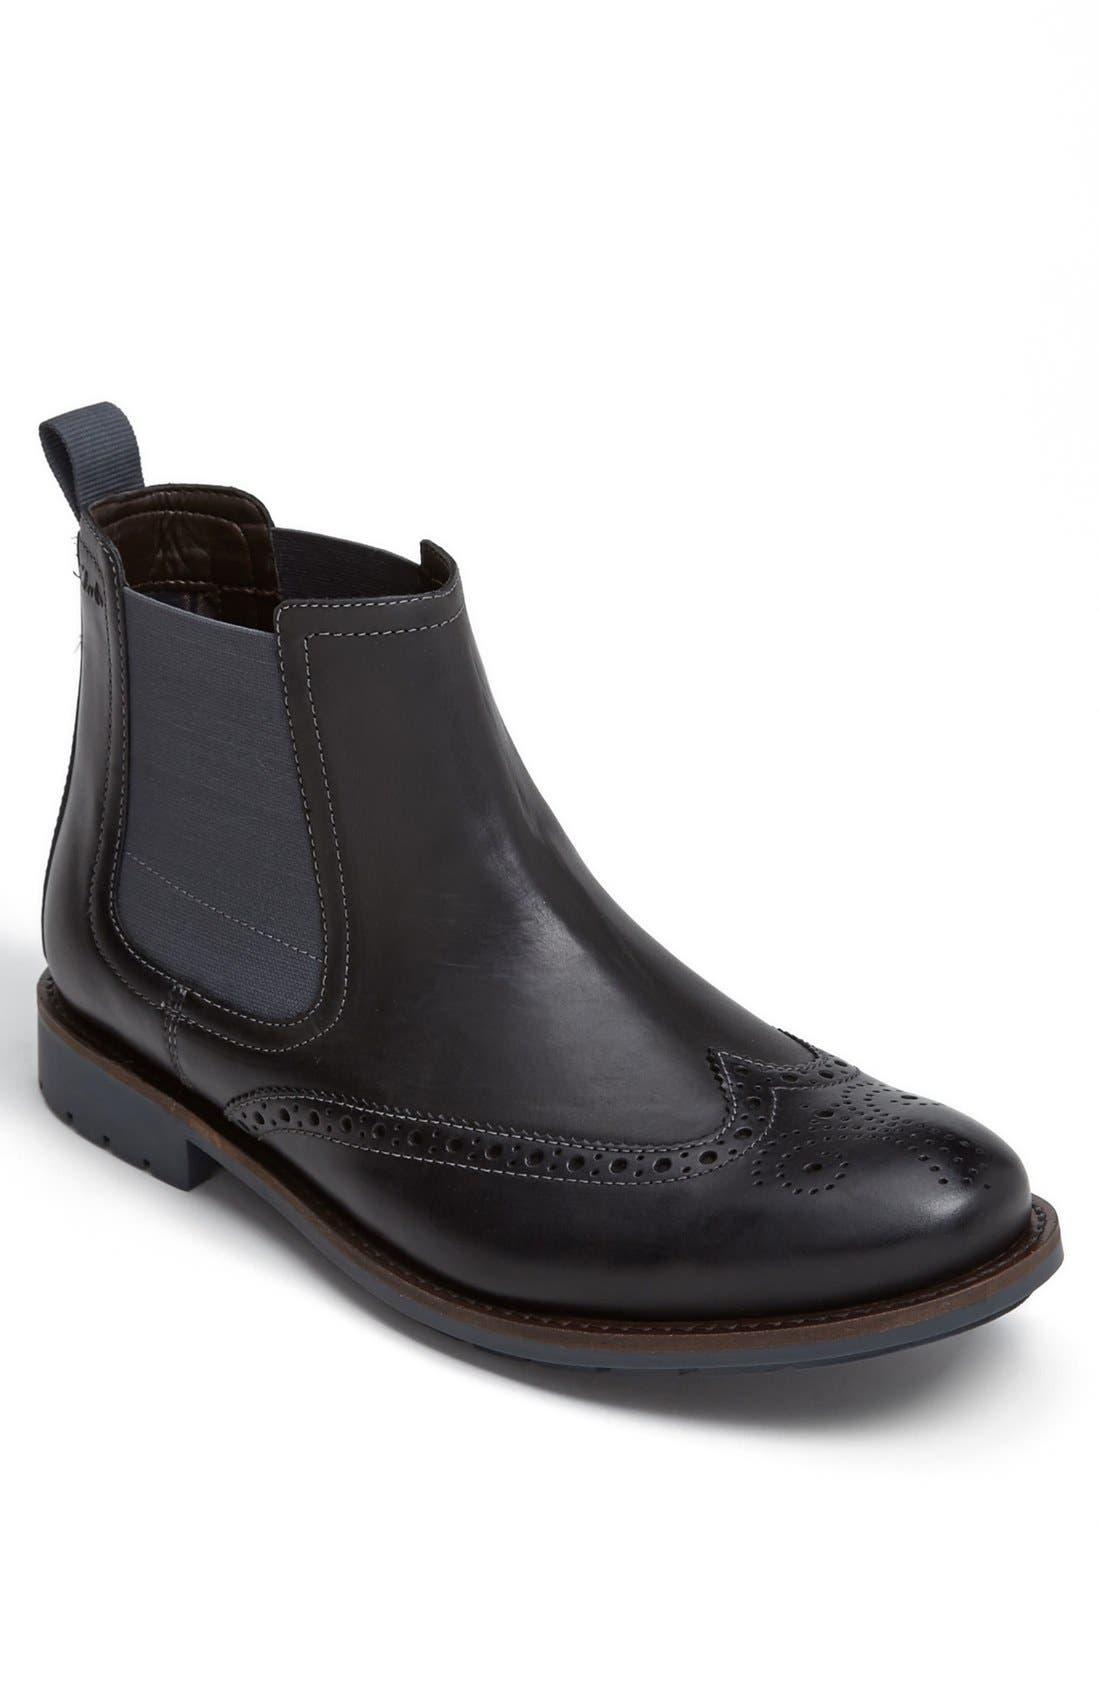 Alternate Image 1 Selected - Clarks® 'Garnet' Wingtip Chelsea Boot   (Men)